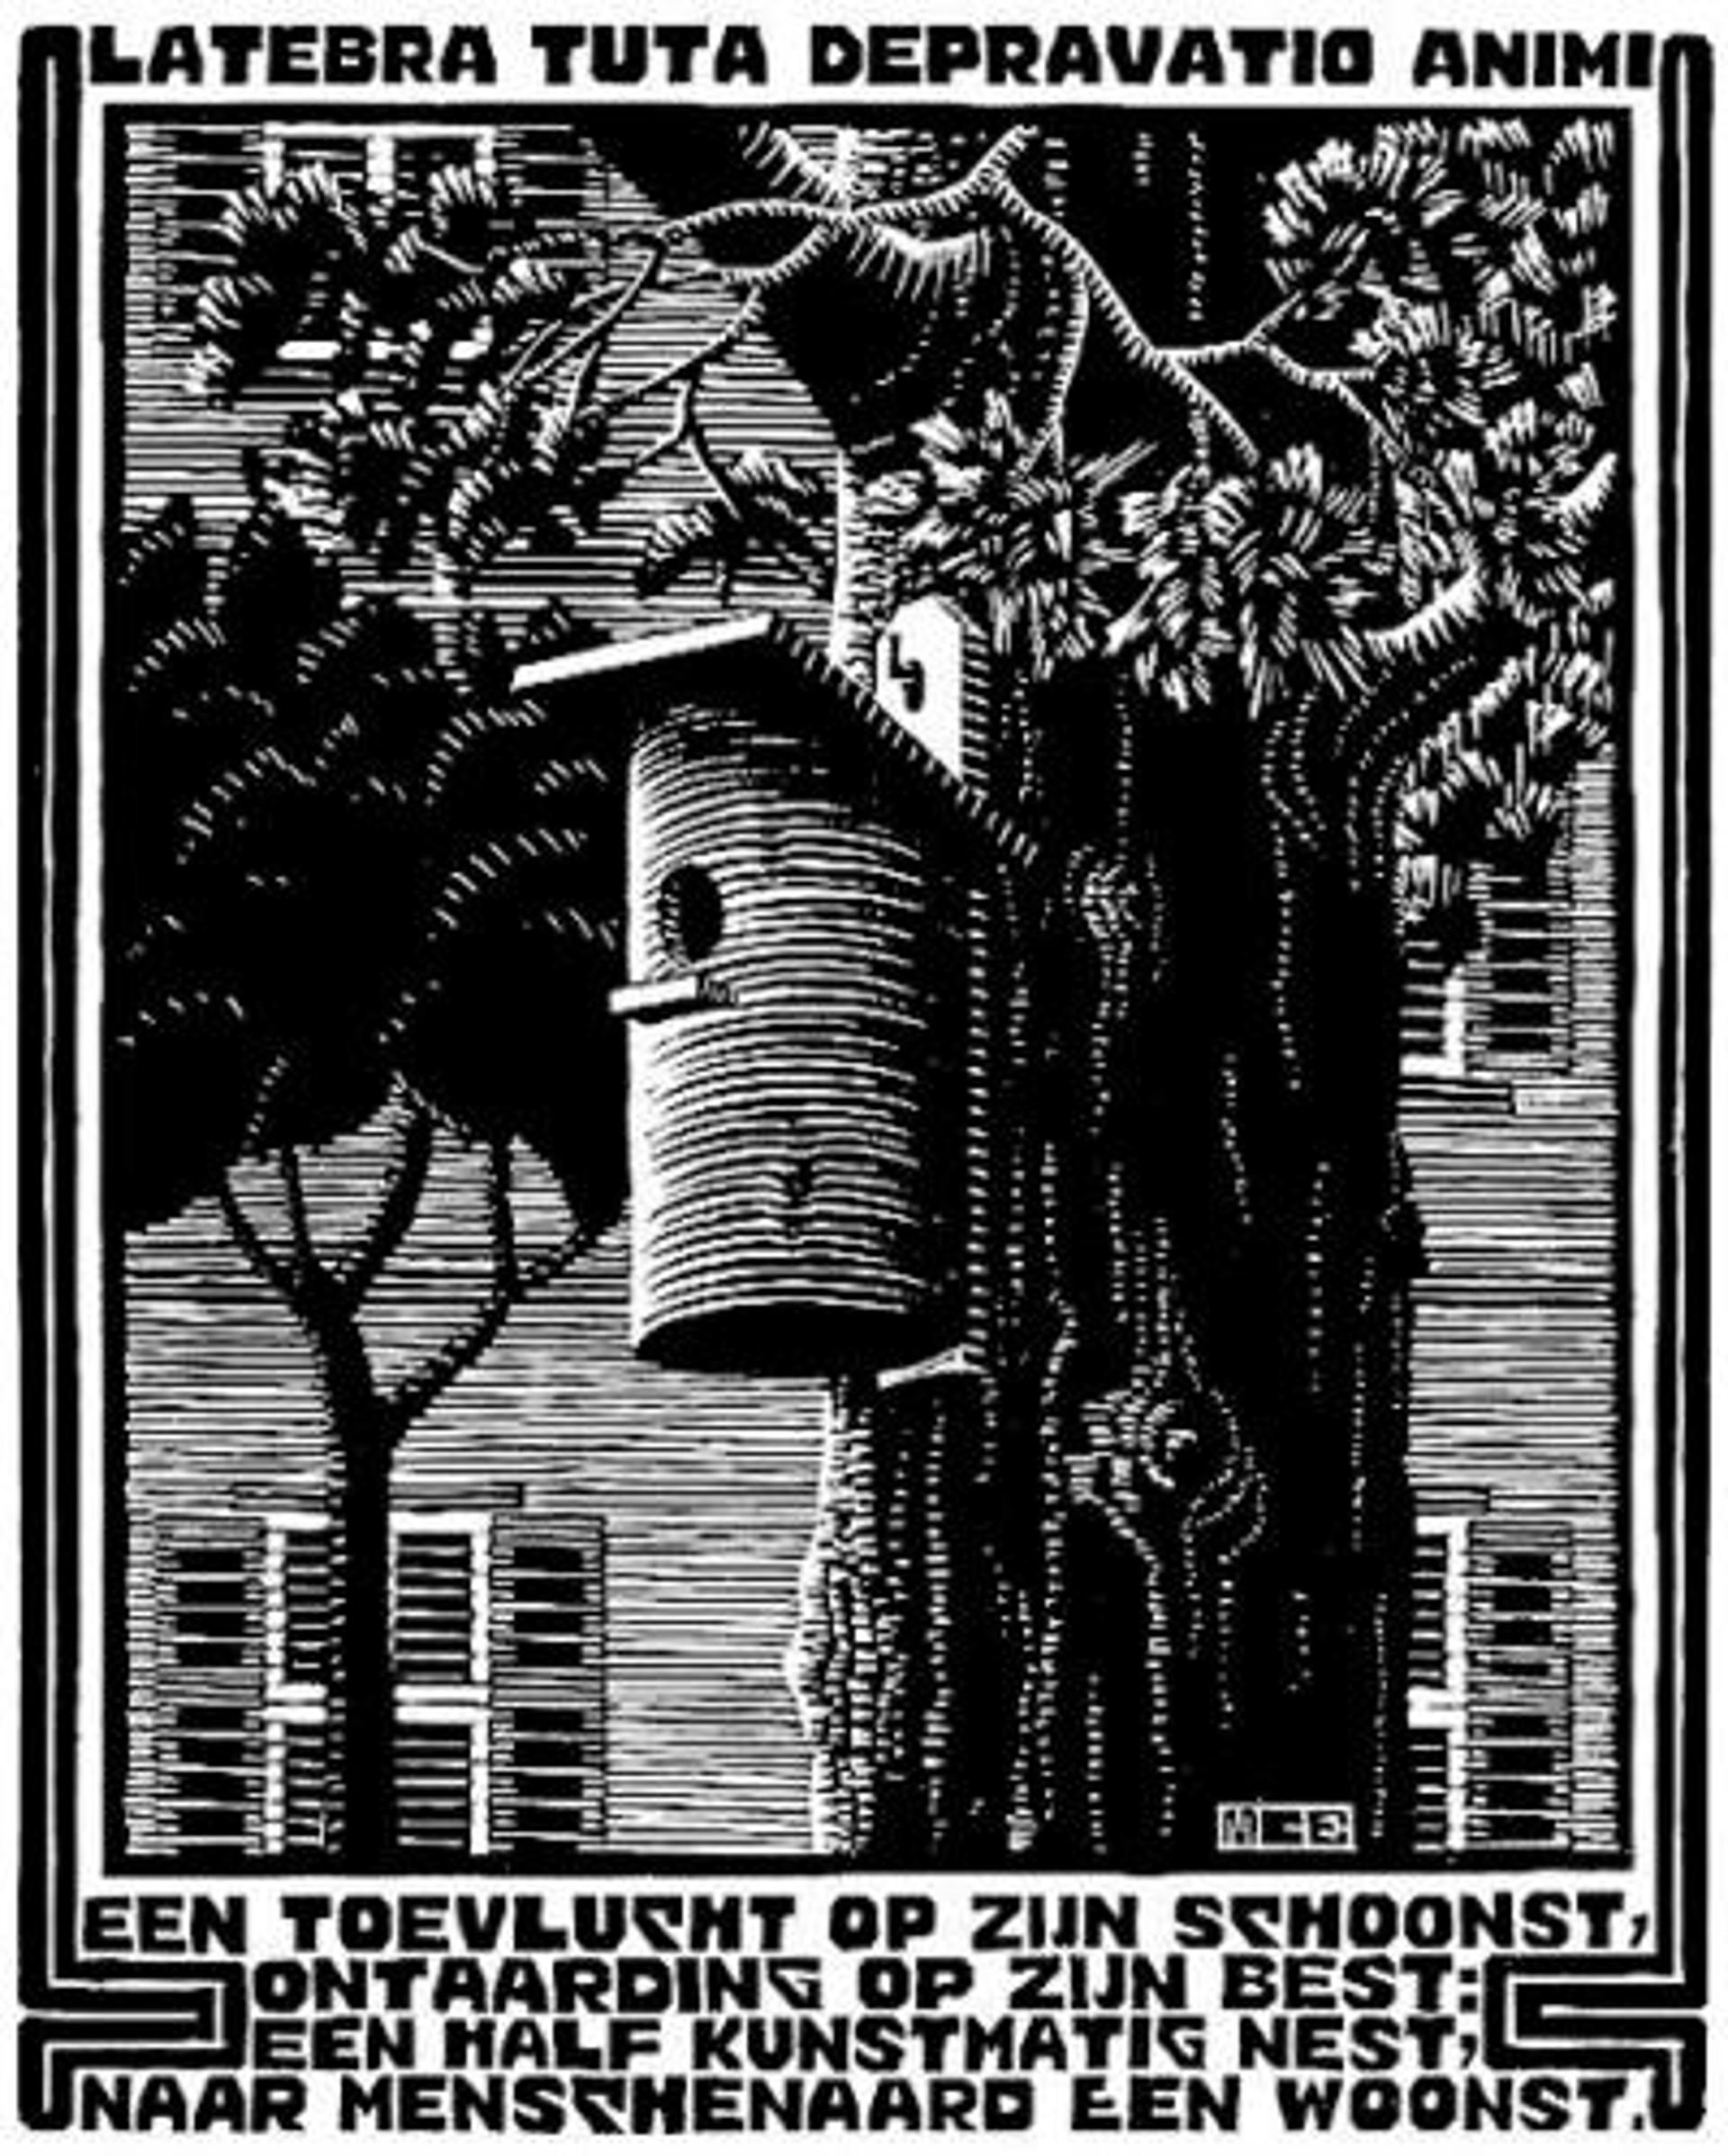 Emblemata - Retreat by M.C. Escher